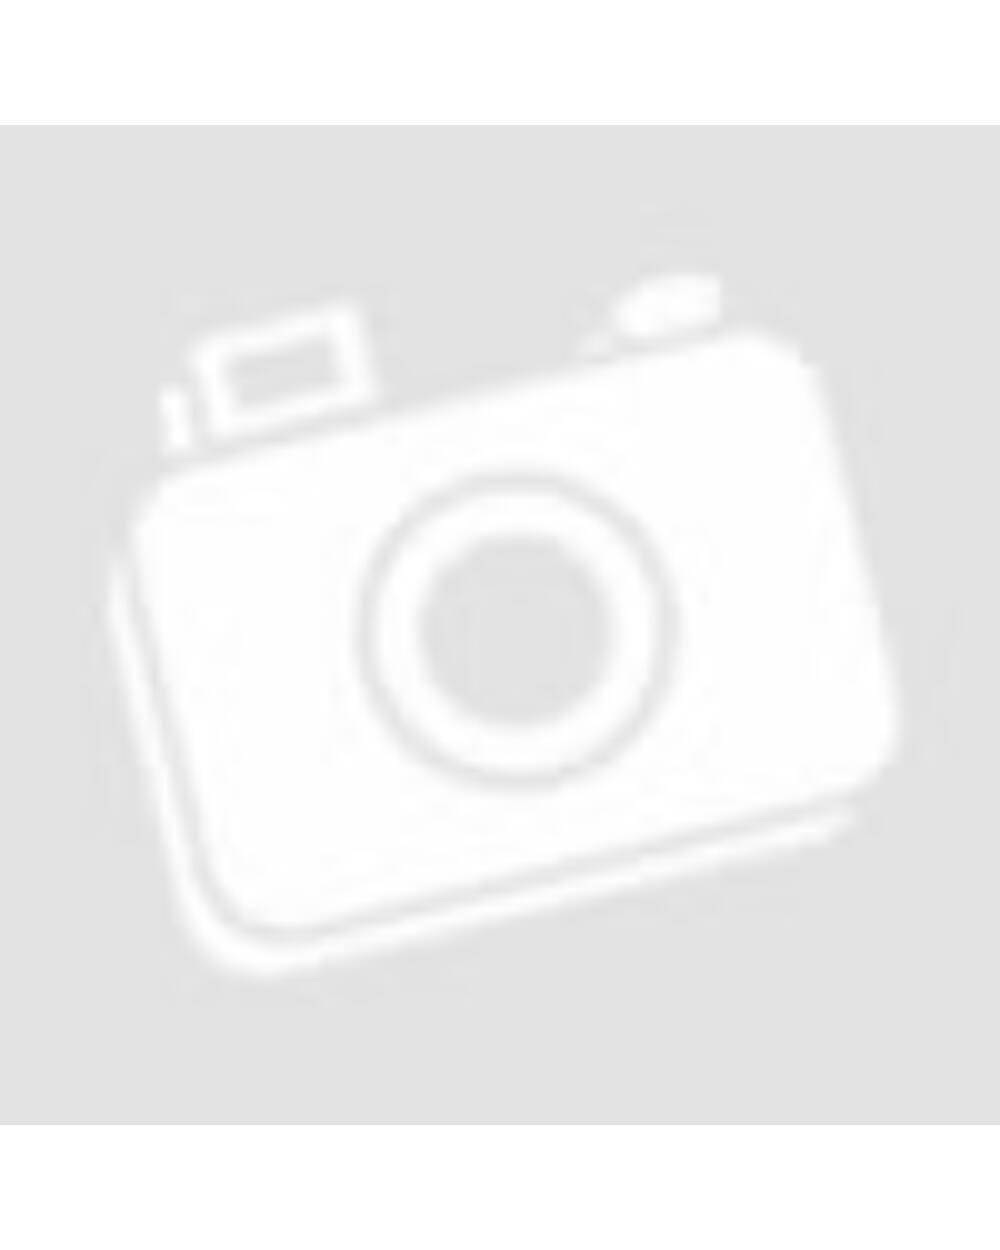 Uvex Finale Junior nyári bukósisak, fehér, 51-55 cm